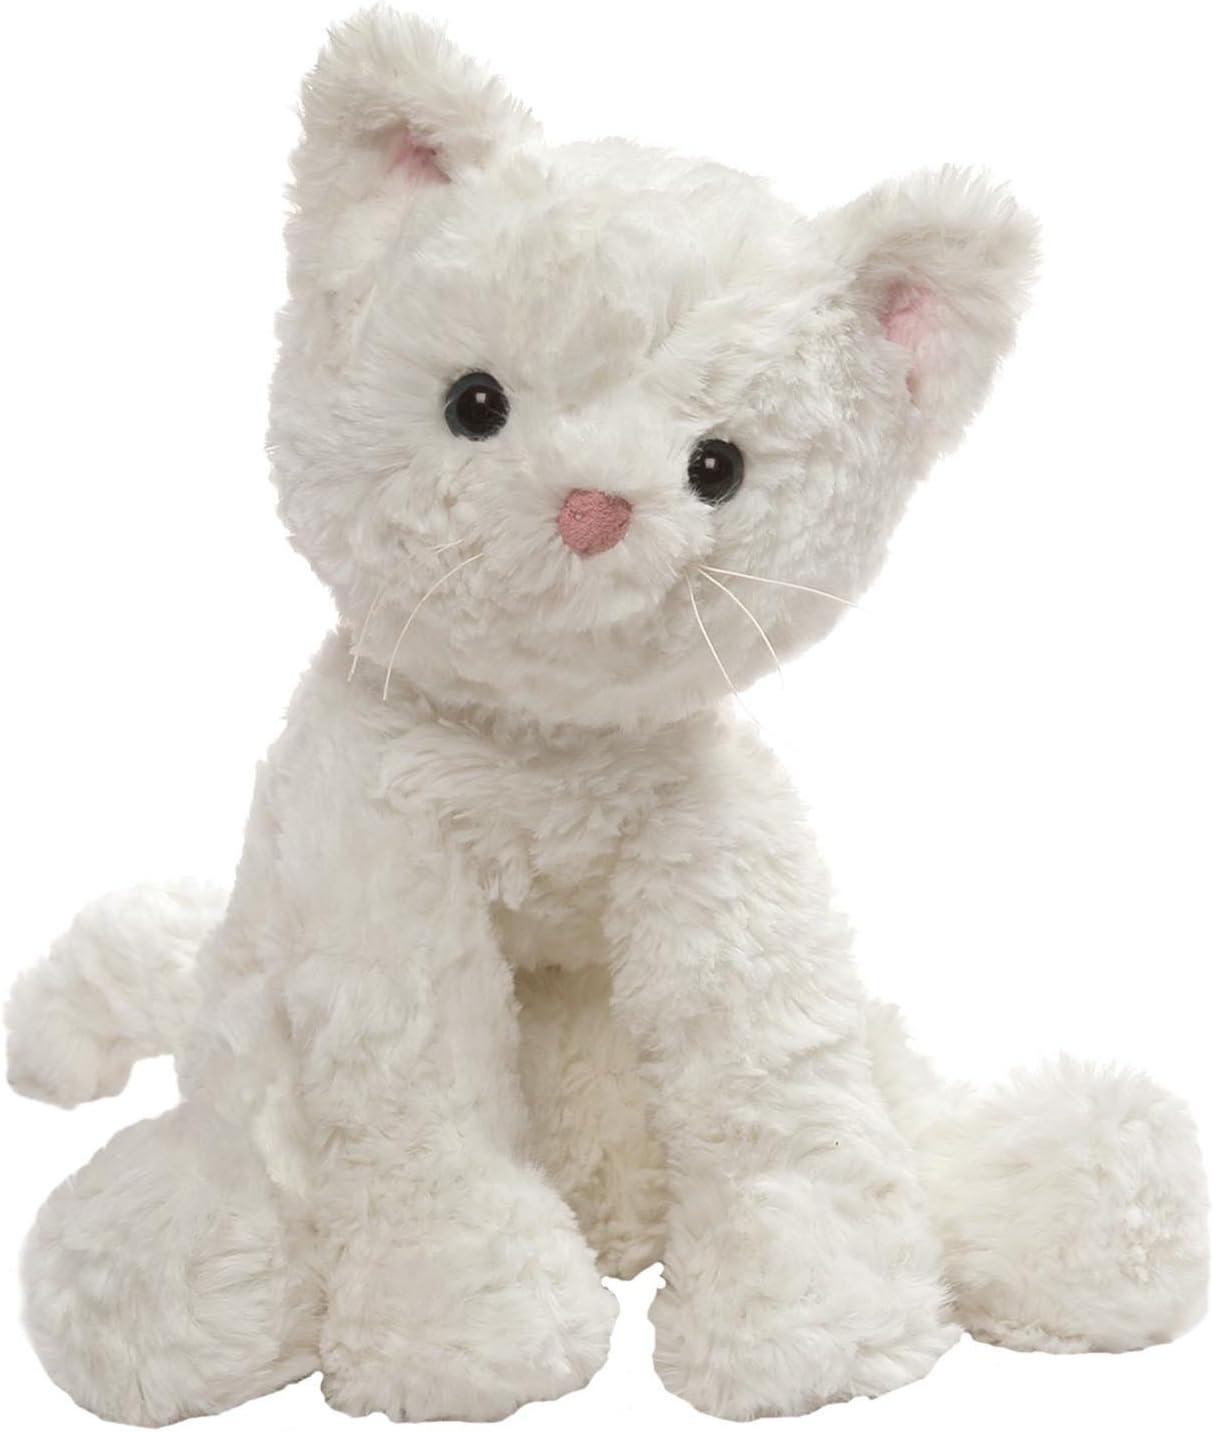 "GUND Cozys Collection Cat Stuffed Animal Plush, White, 8"""